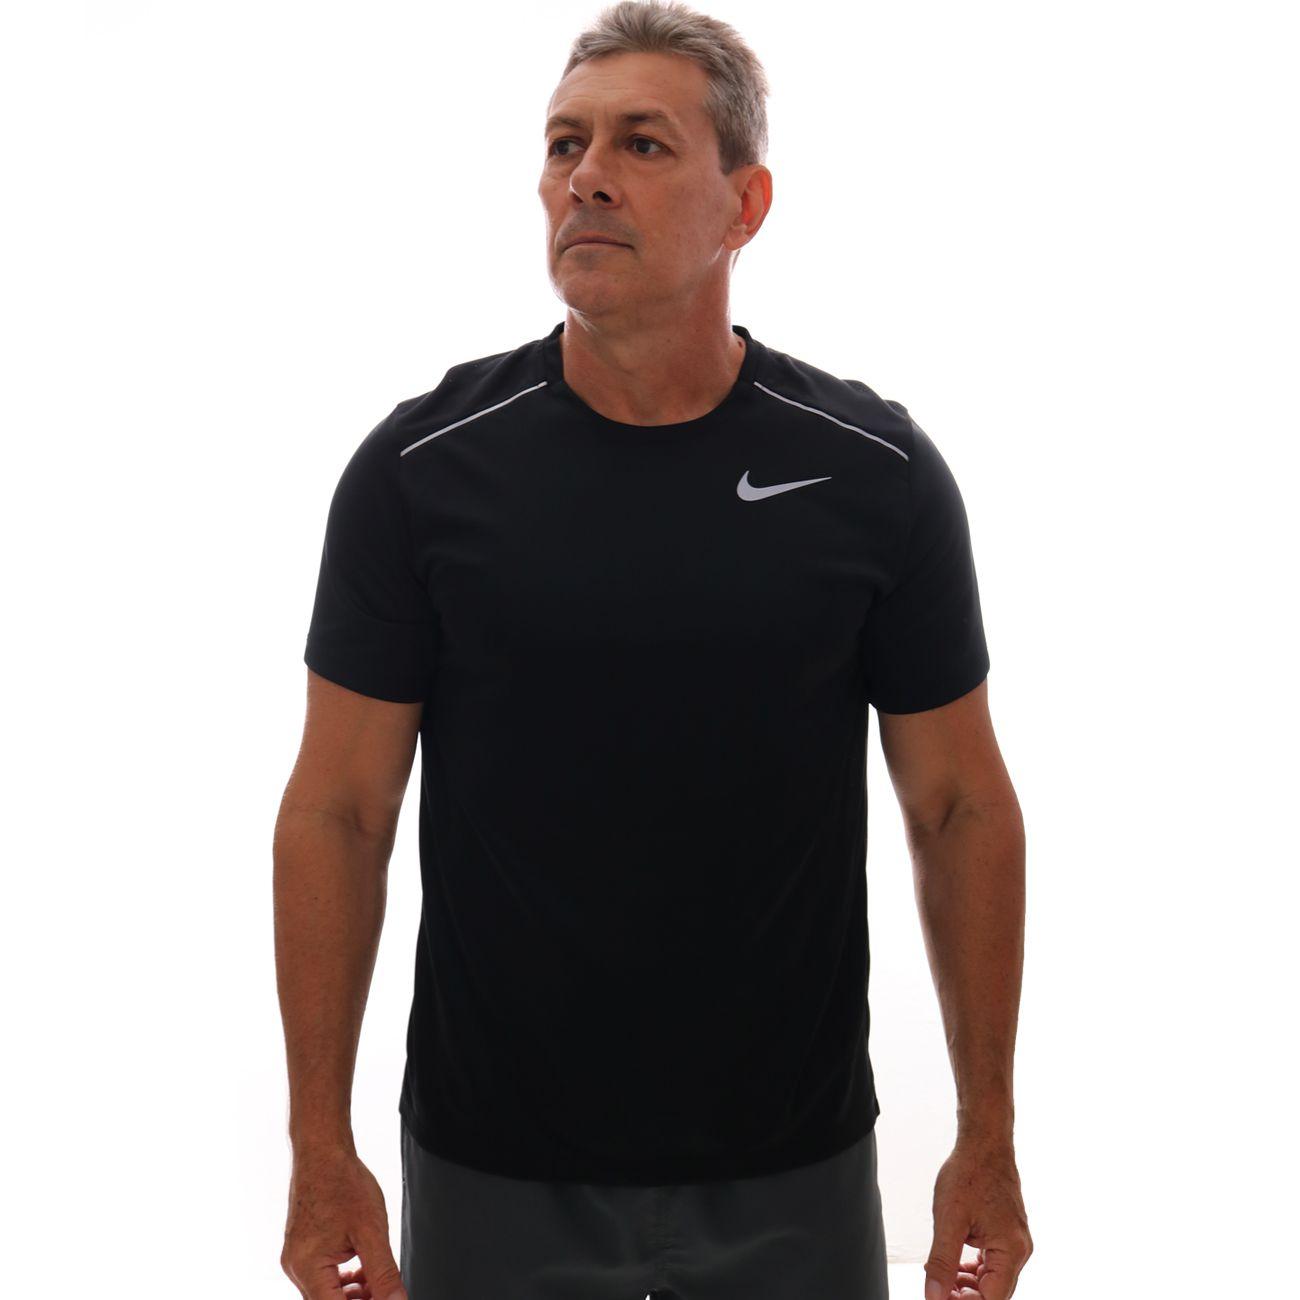 Camiseta Nike Dri-FIT Miler Preto